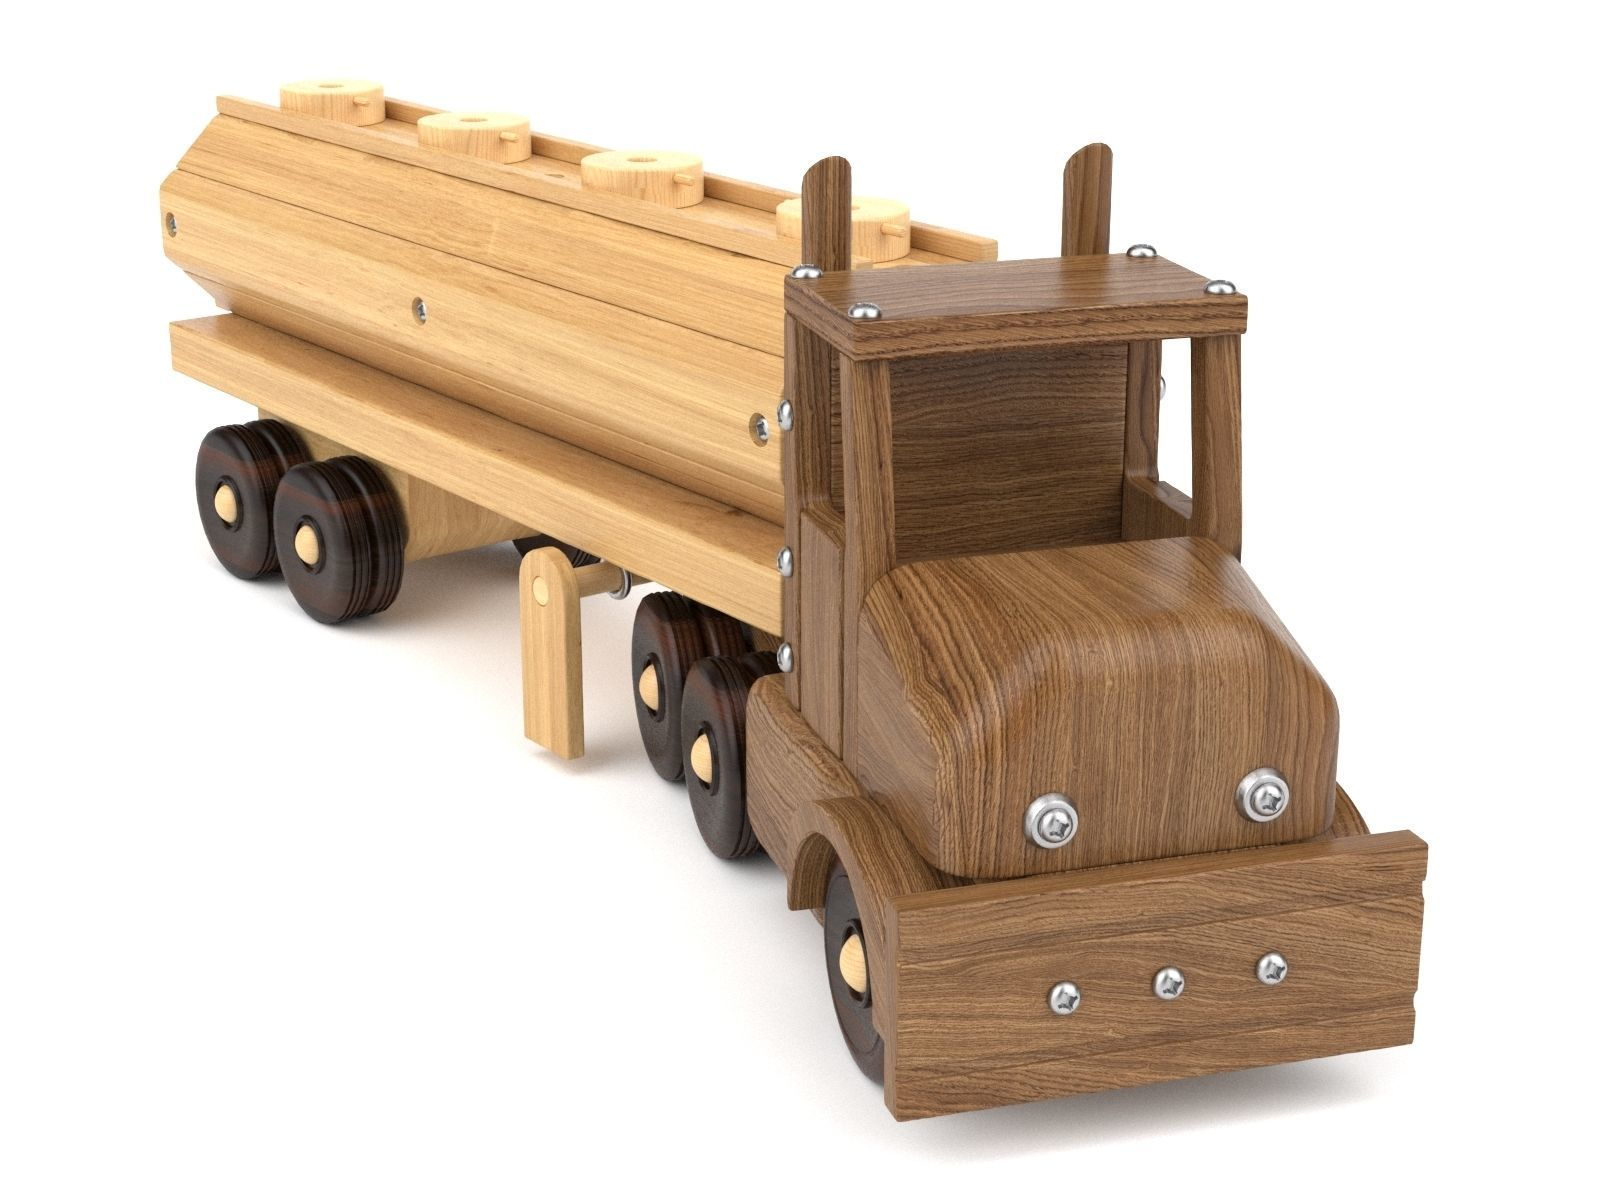 Wooden toy truck 28